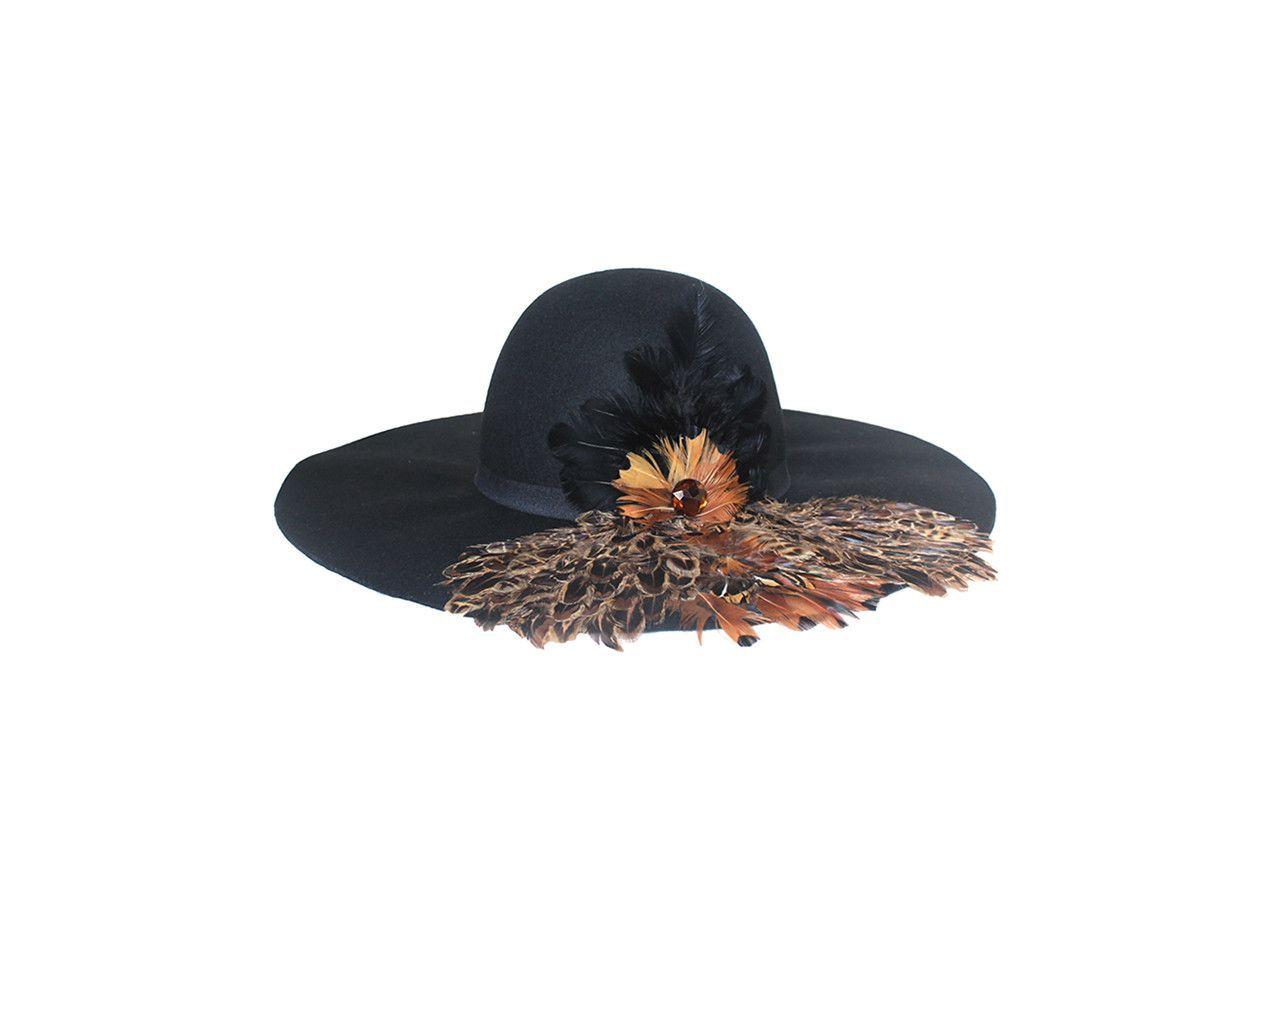 Black Faux Wool Floppy Style Hat - The Ivanka